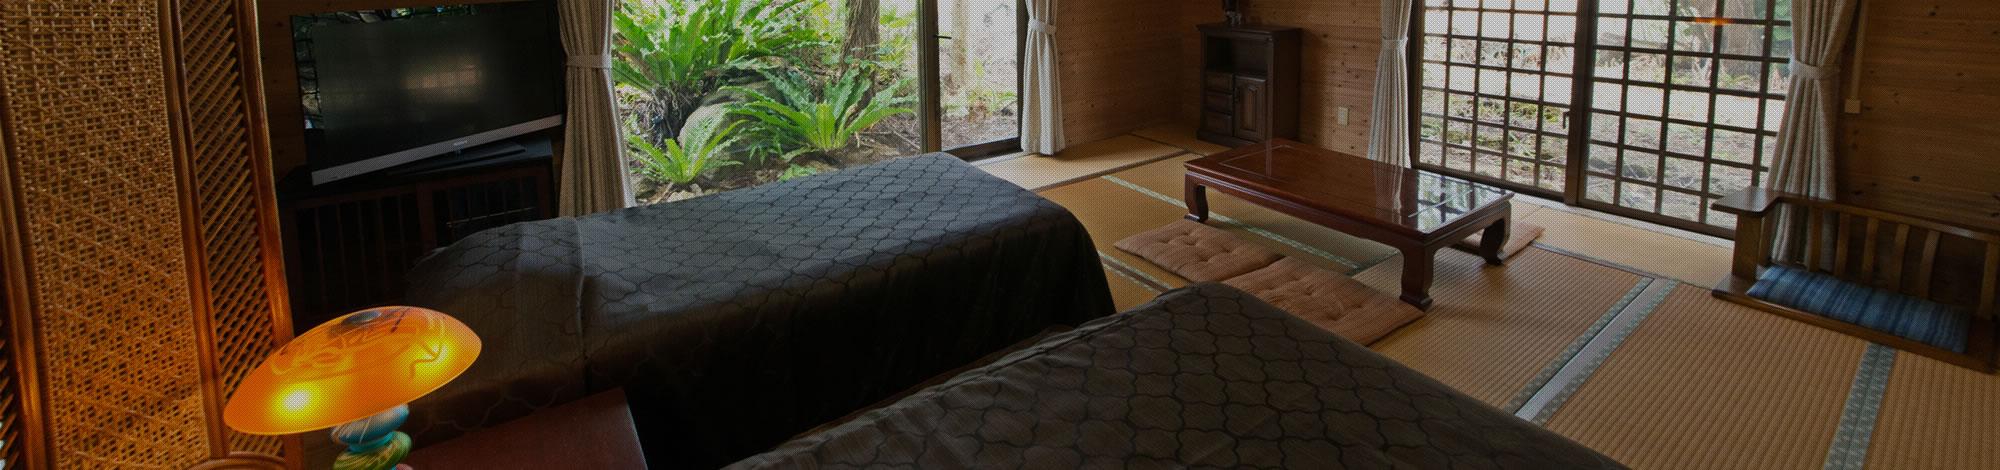 石垣島の宿・部屋